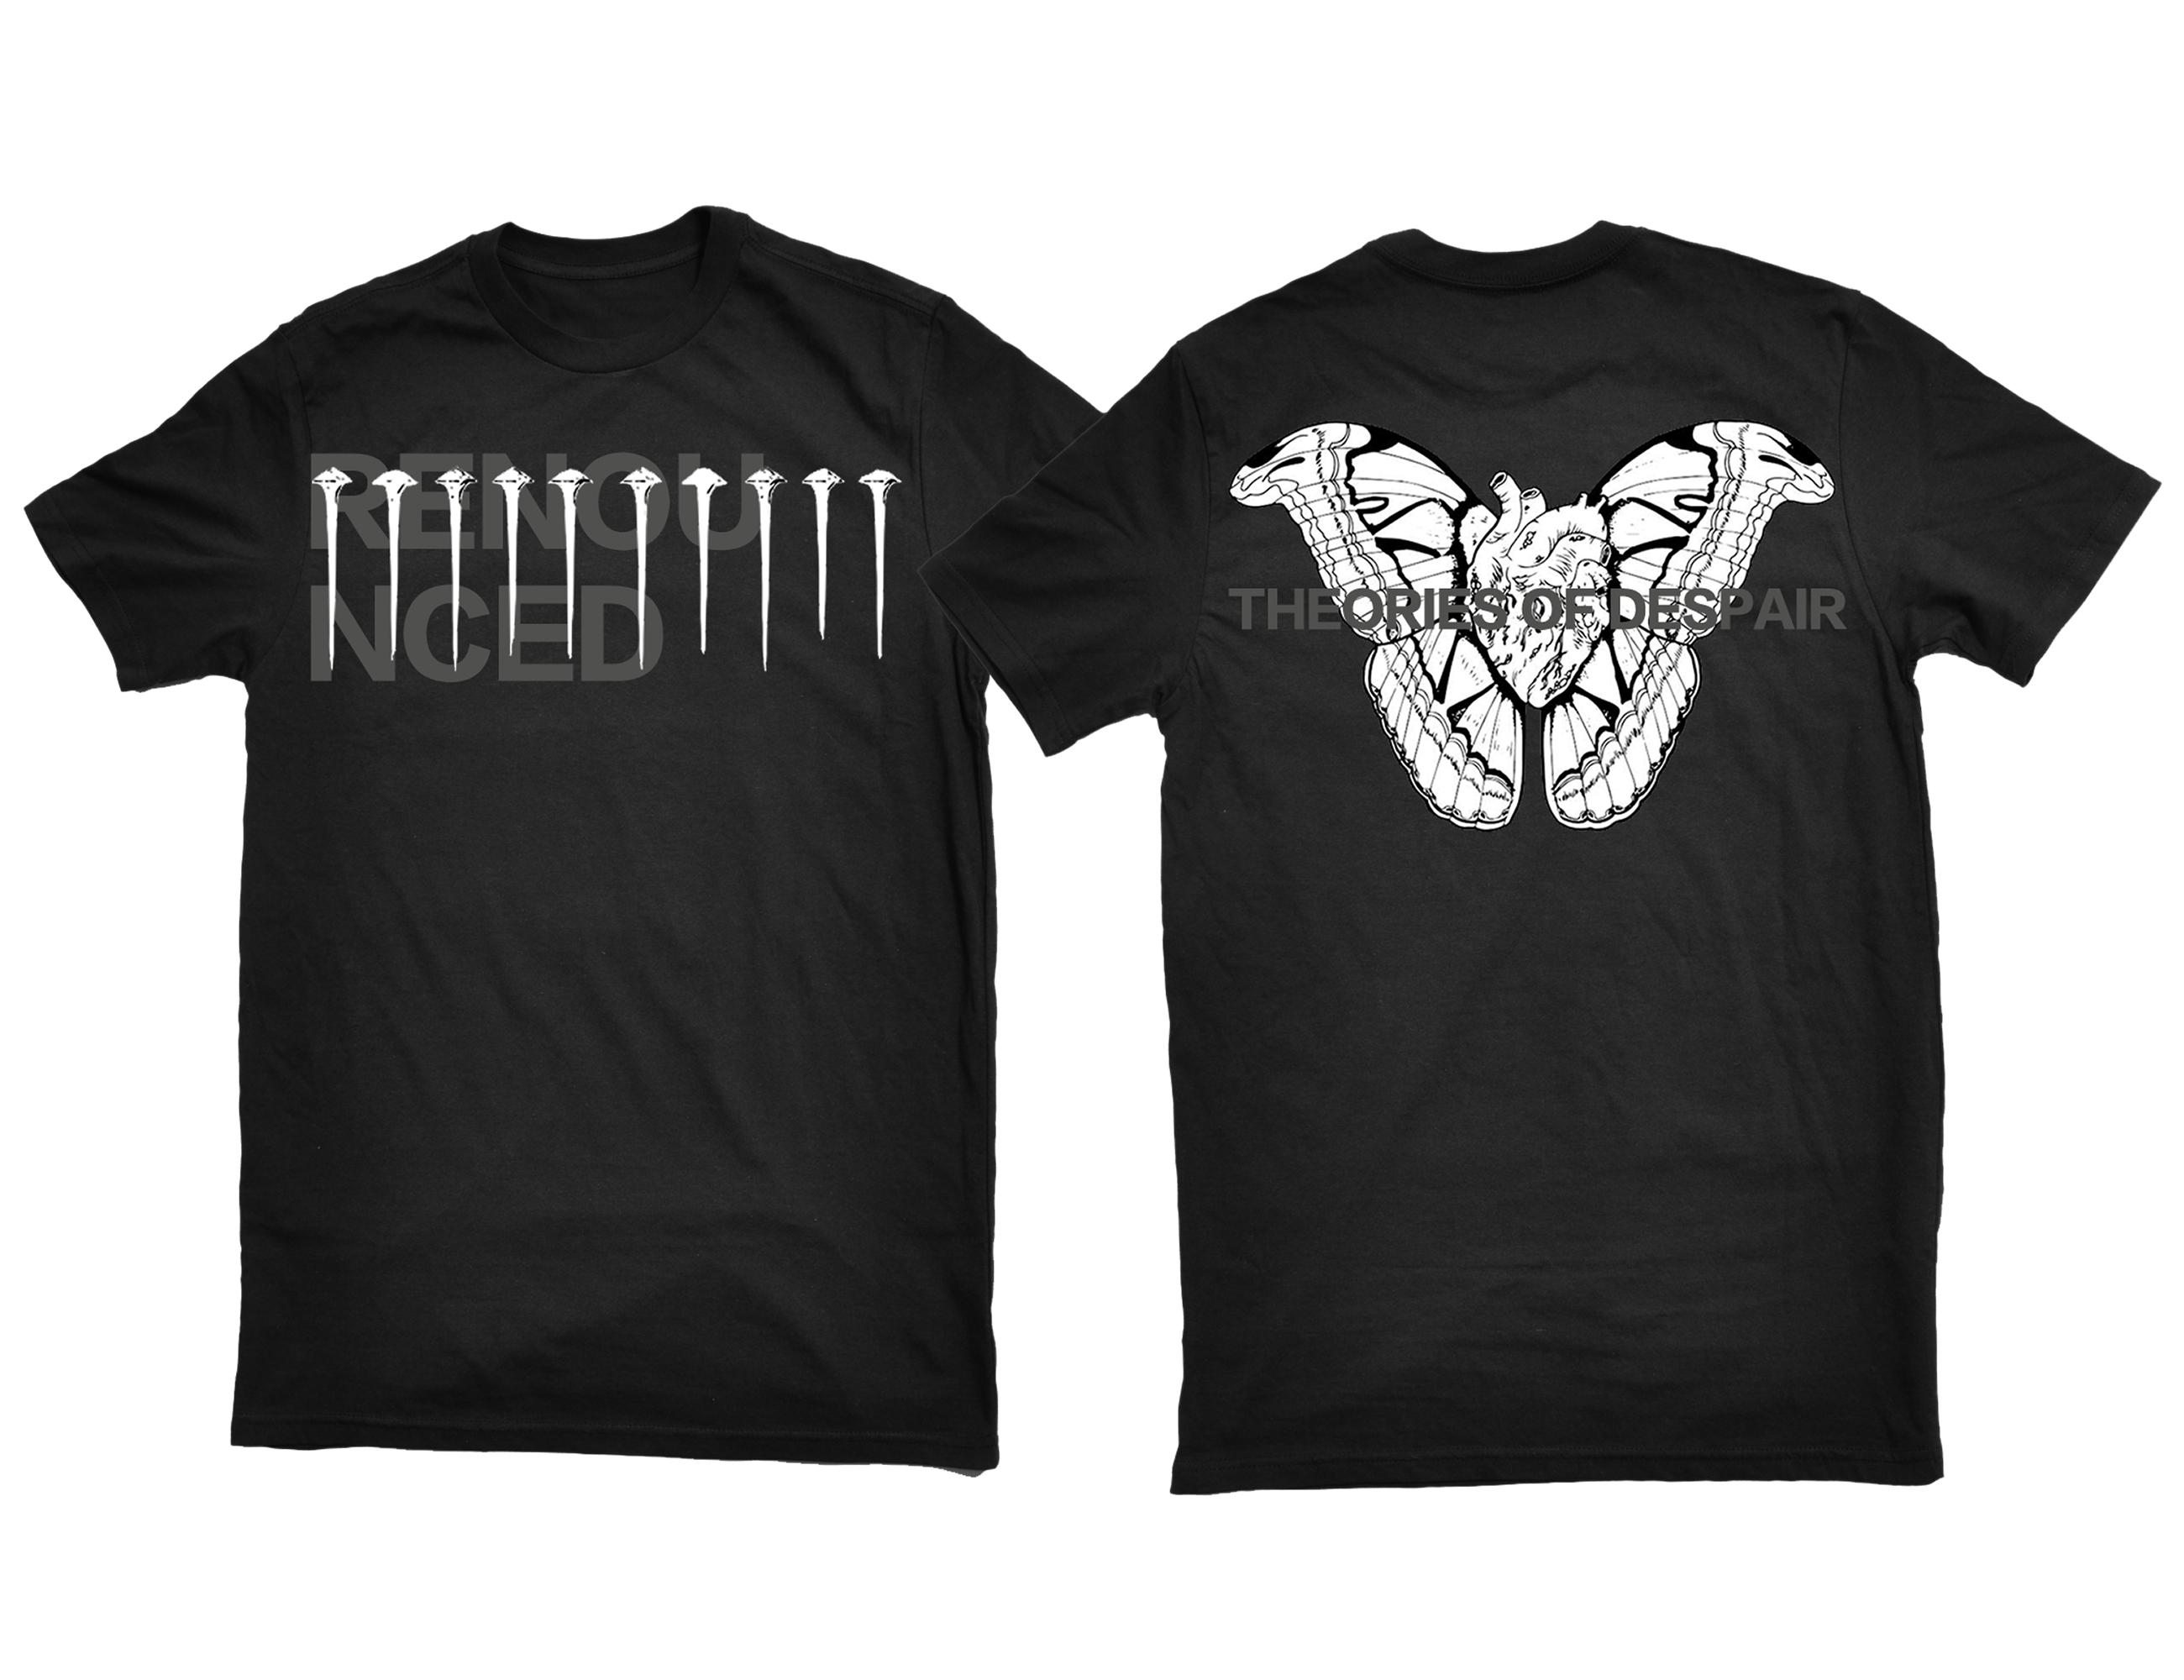 Renounced - Theories Of Despair shirt